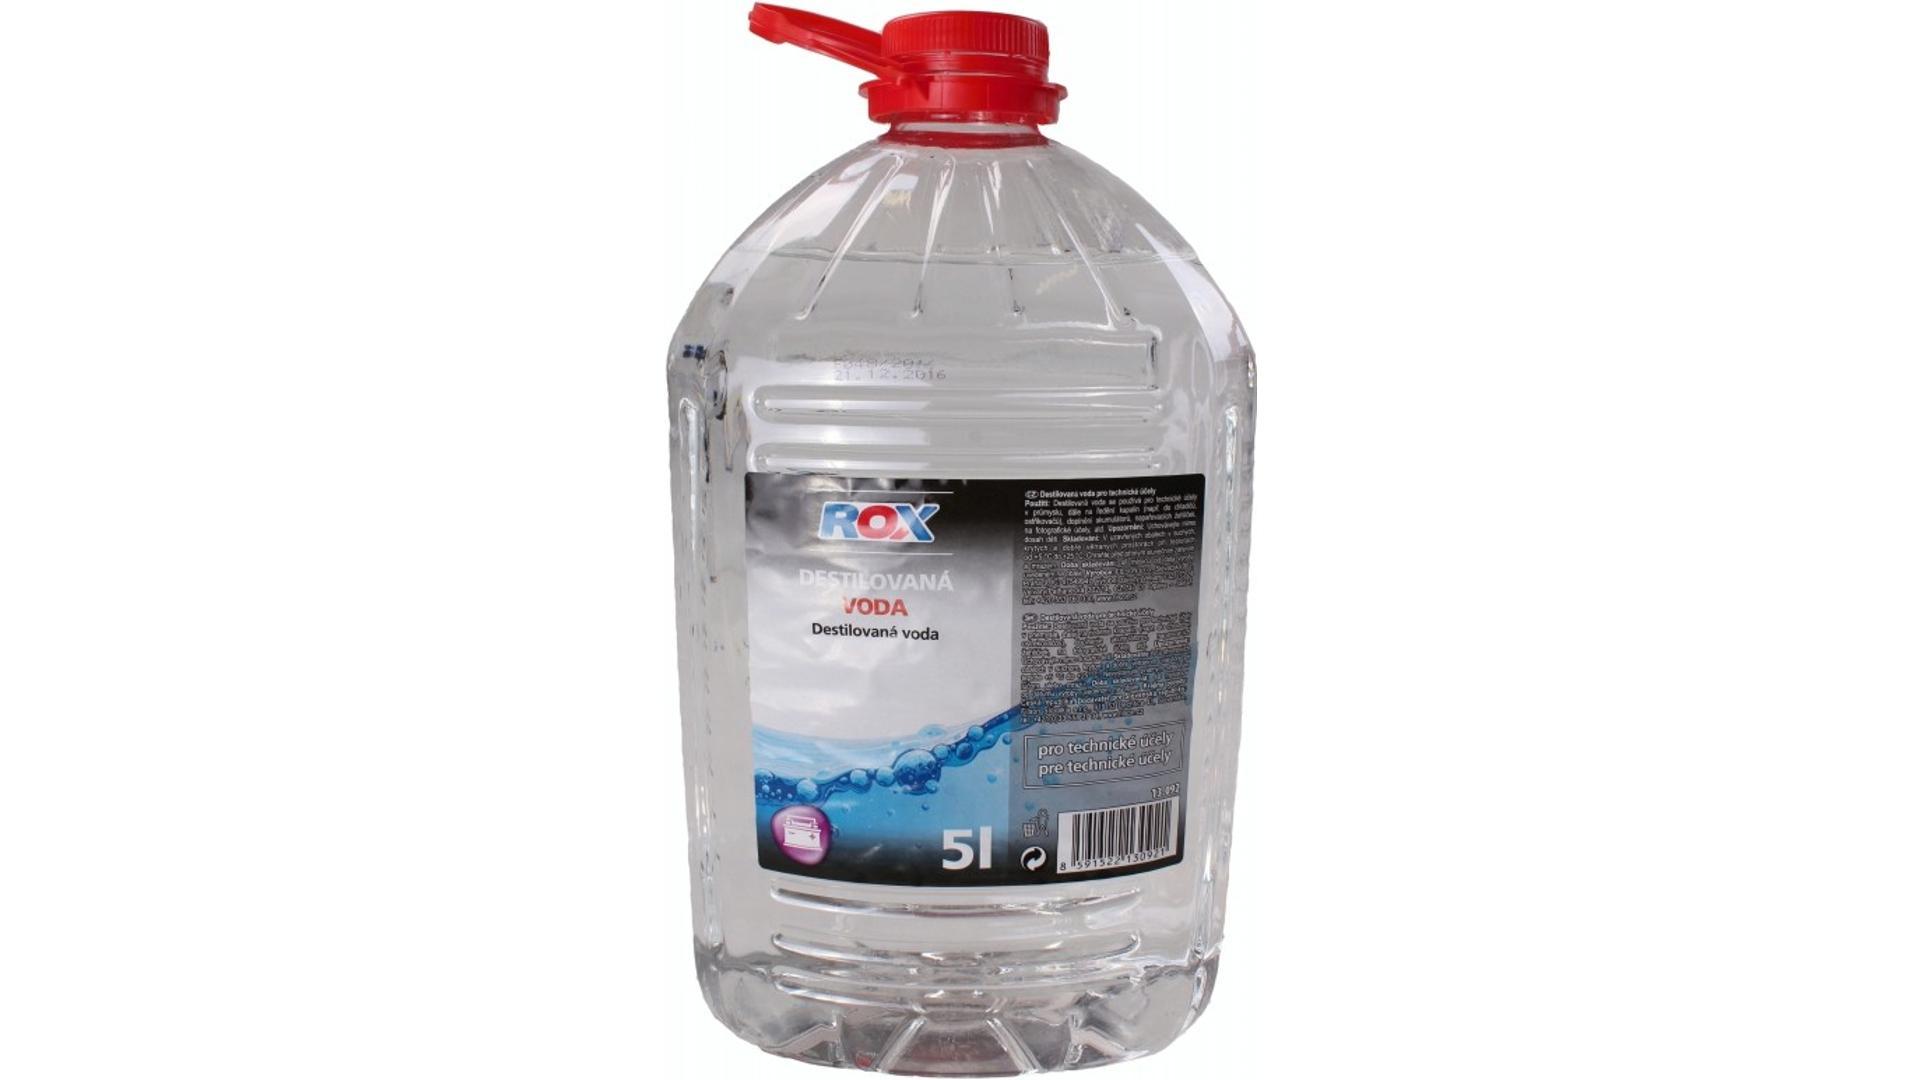 ROX DESTILOVANÁ VODA - 5L